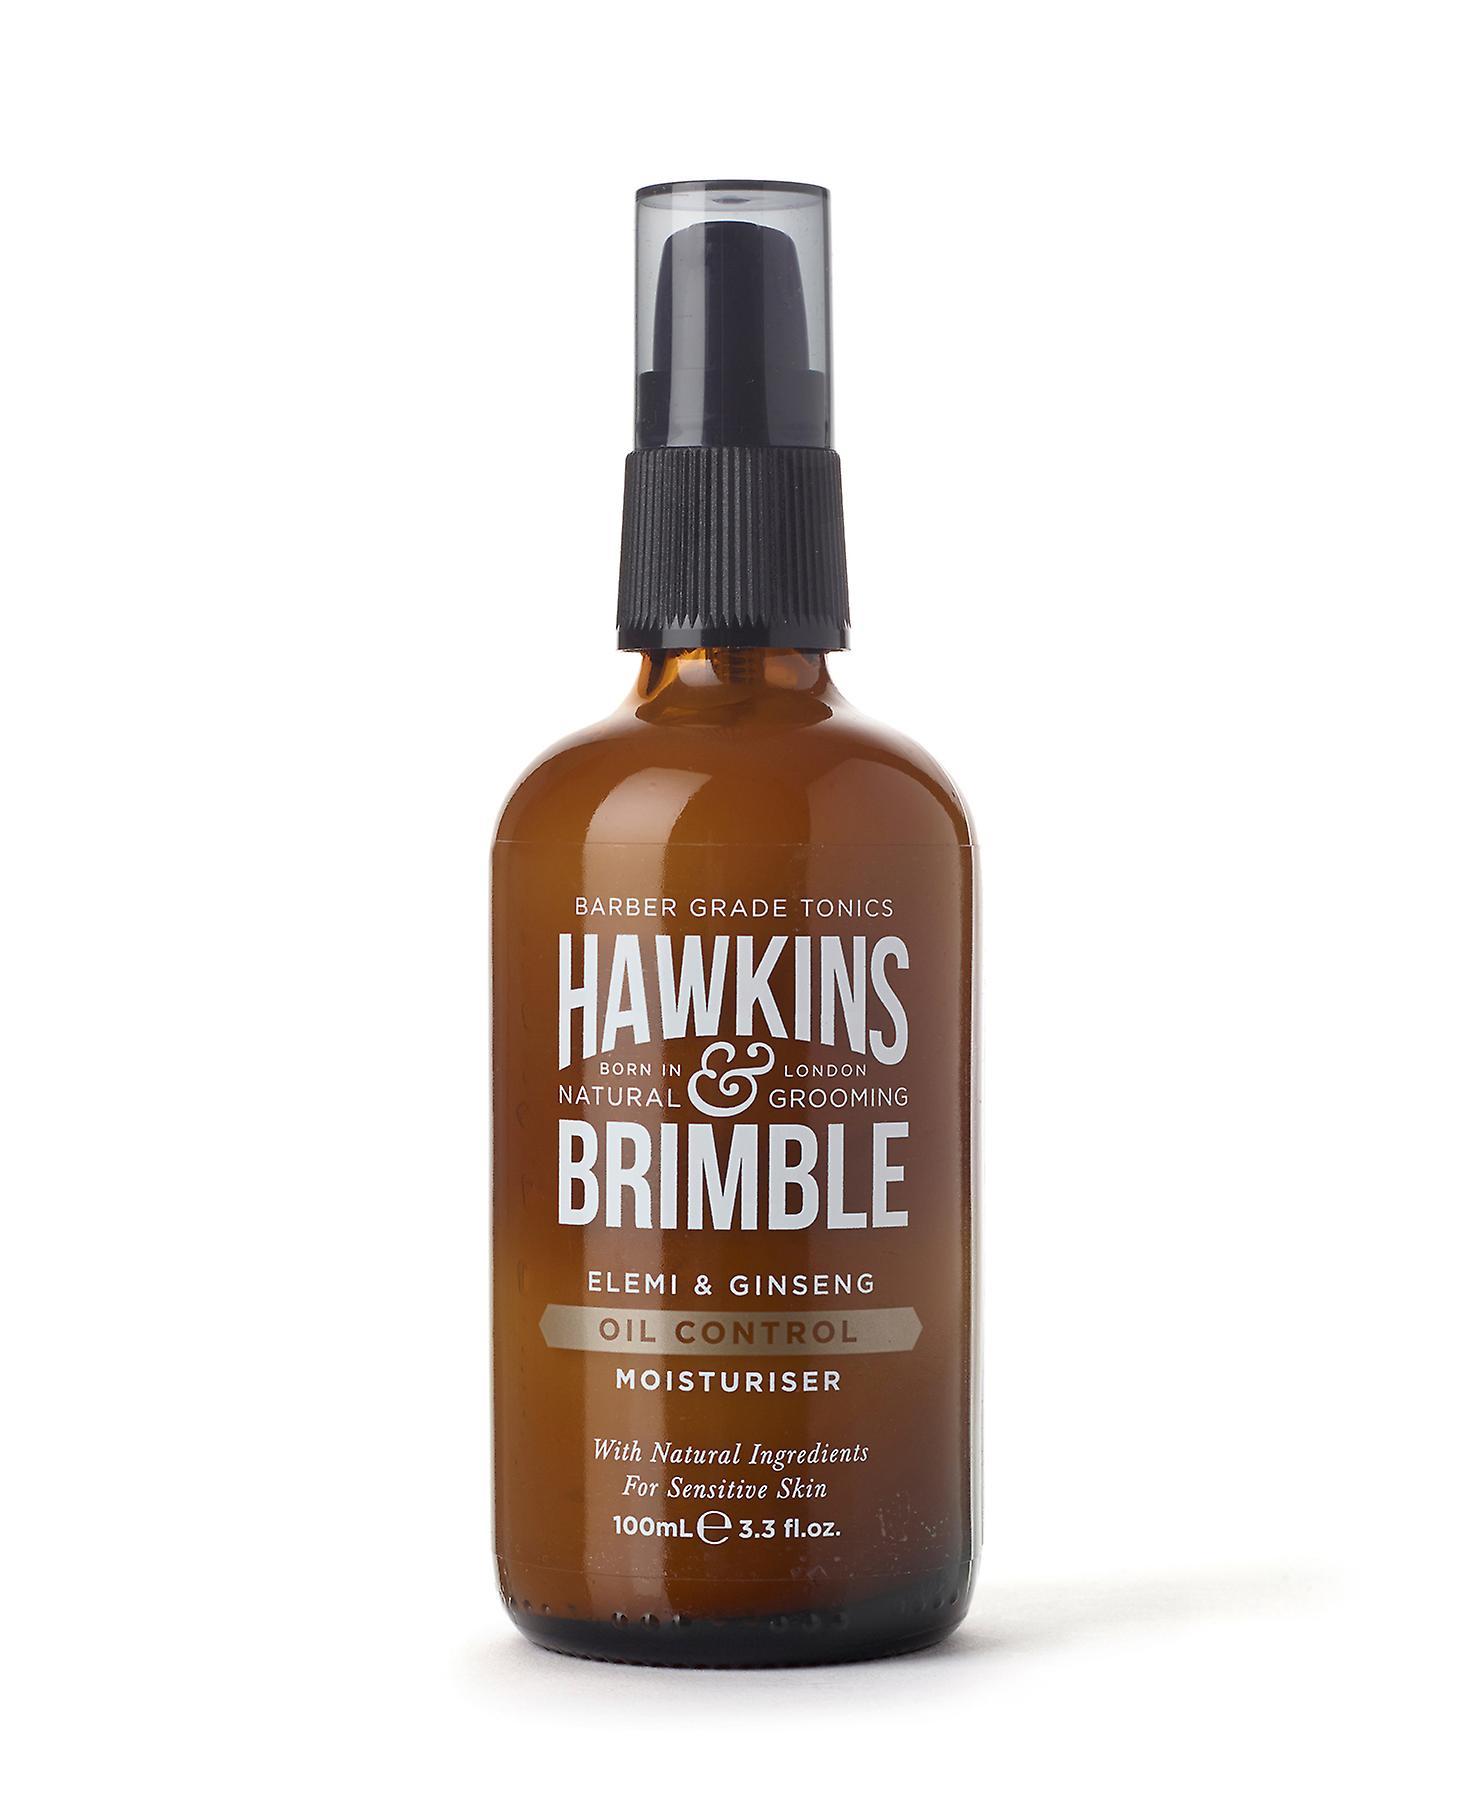 Hawkins & Brimble Oil Control Moisturiser (100ml).